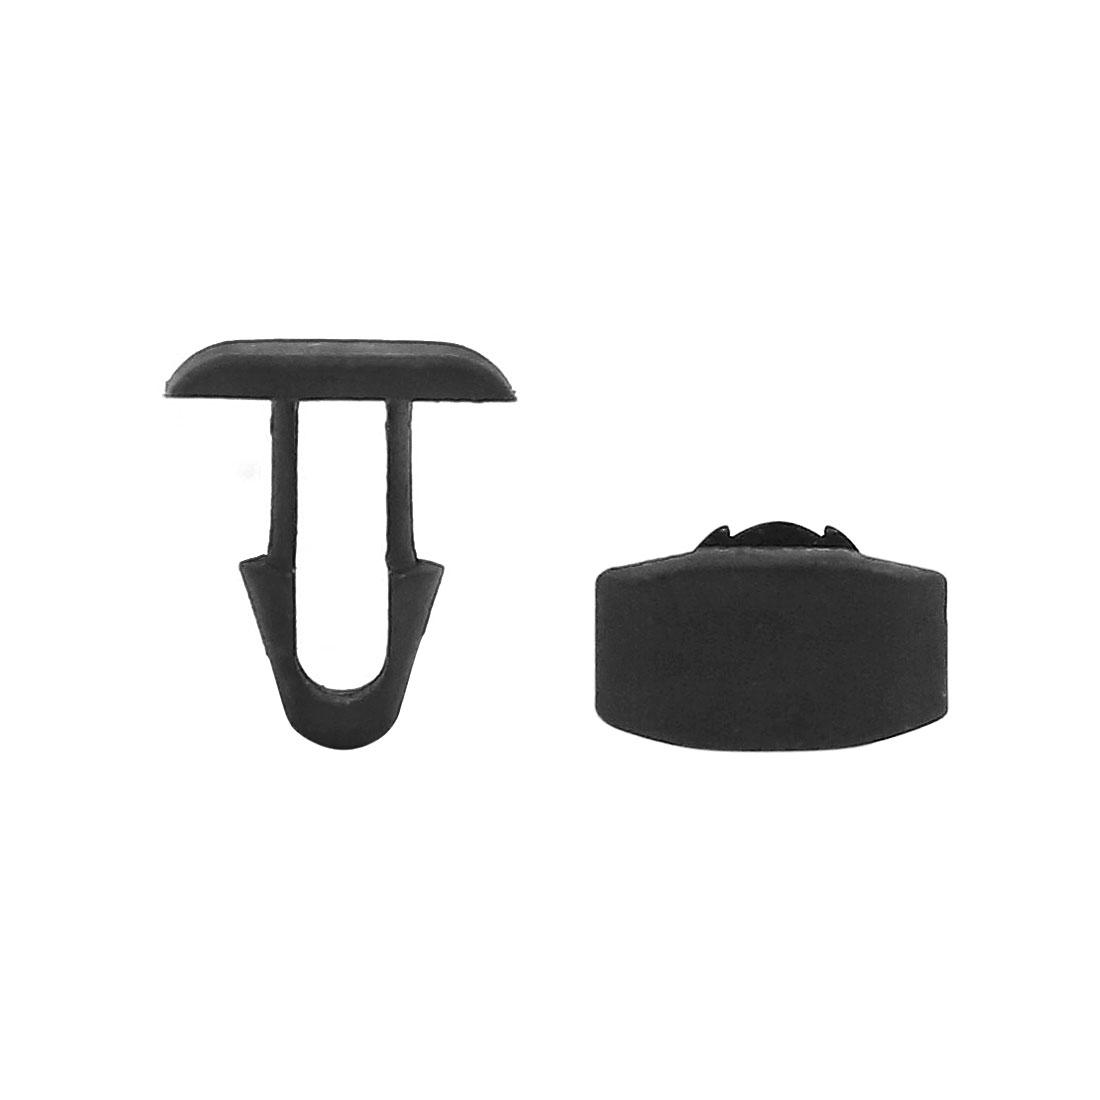 40pcs 7mm Hole Diameter Plastic Rivet Fastener Clips Black for Car Fender Bumper